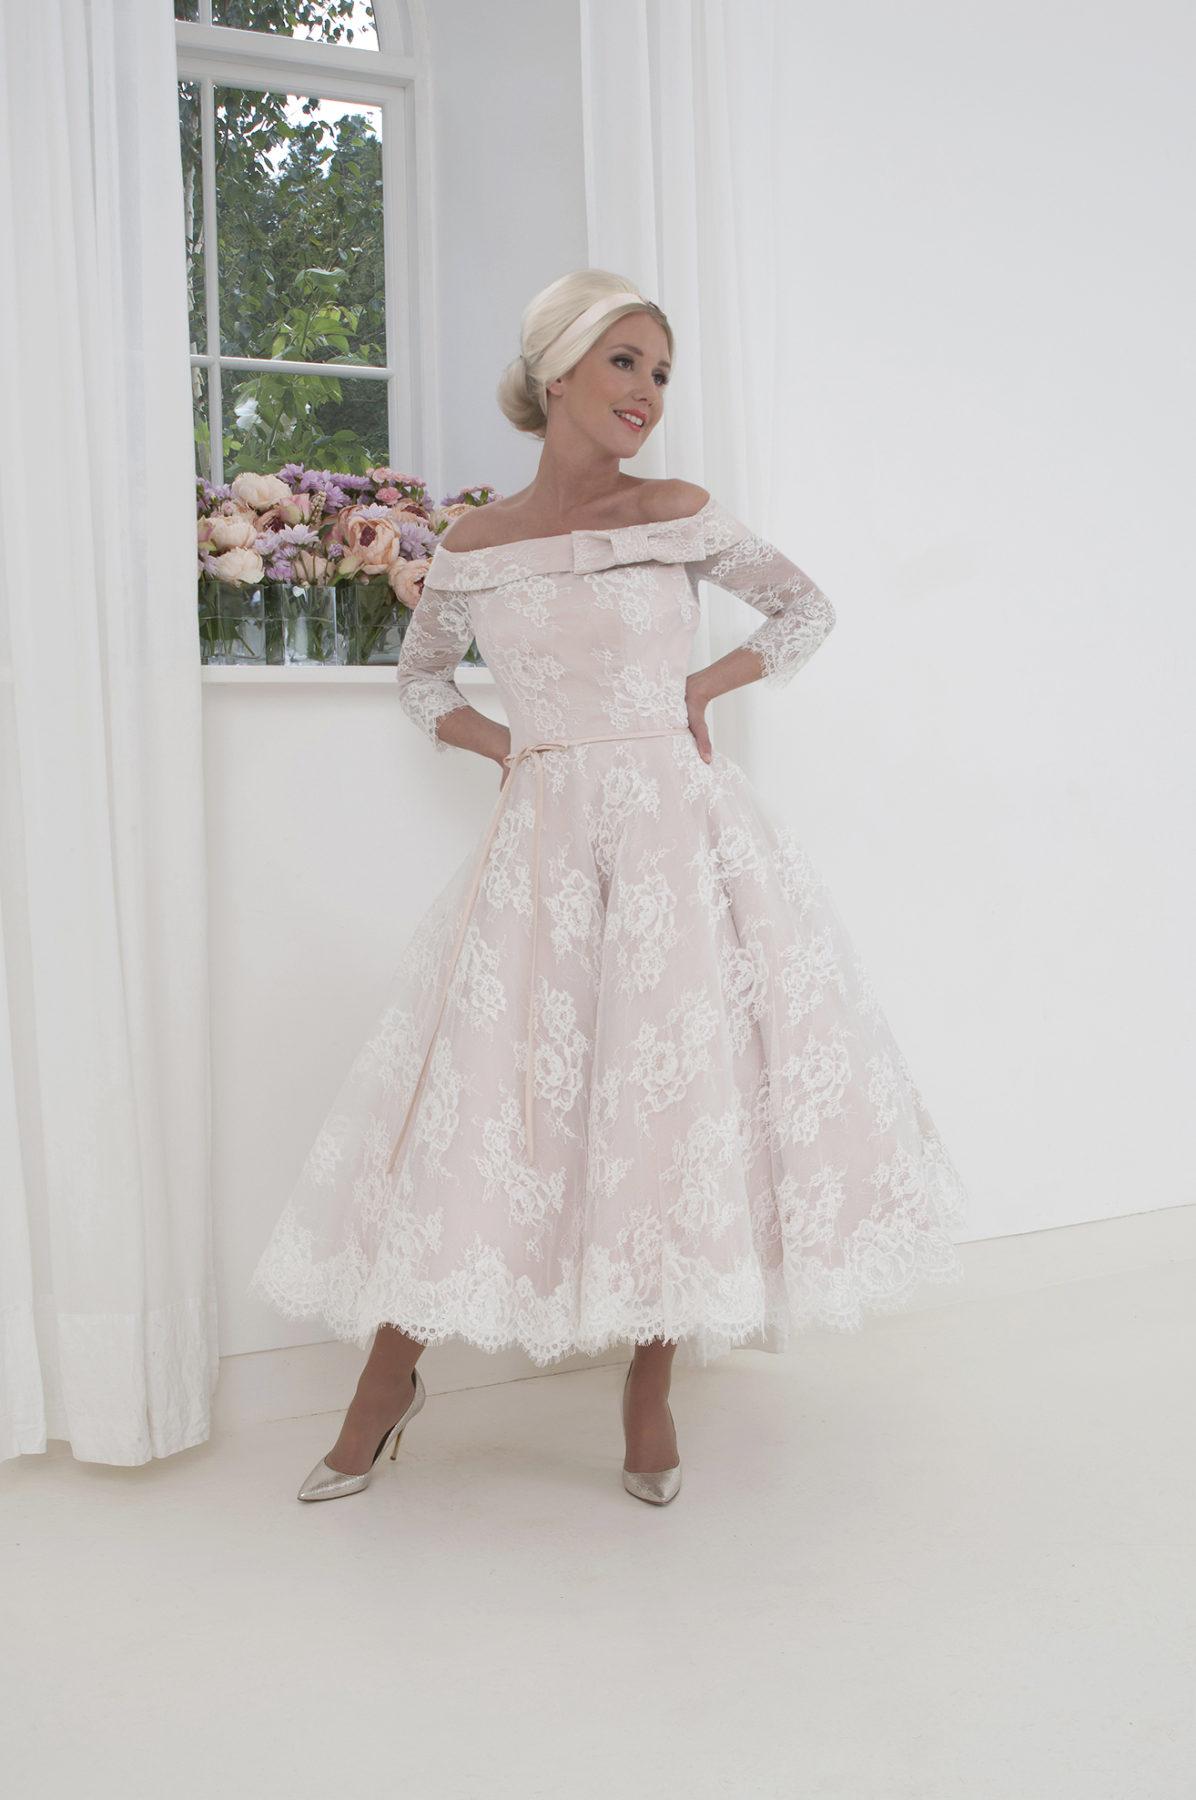 Bardot neckline wedding dress